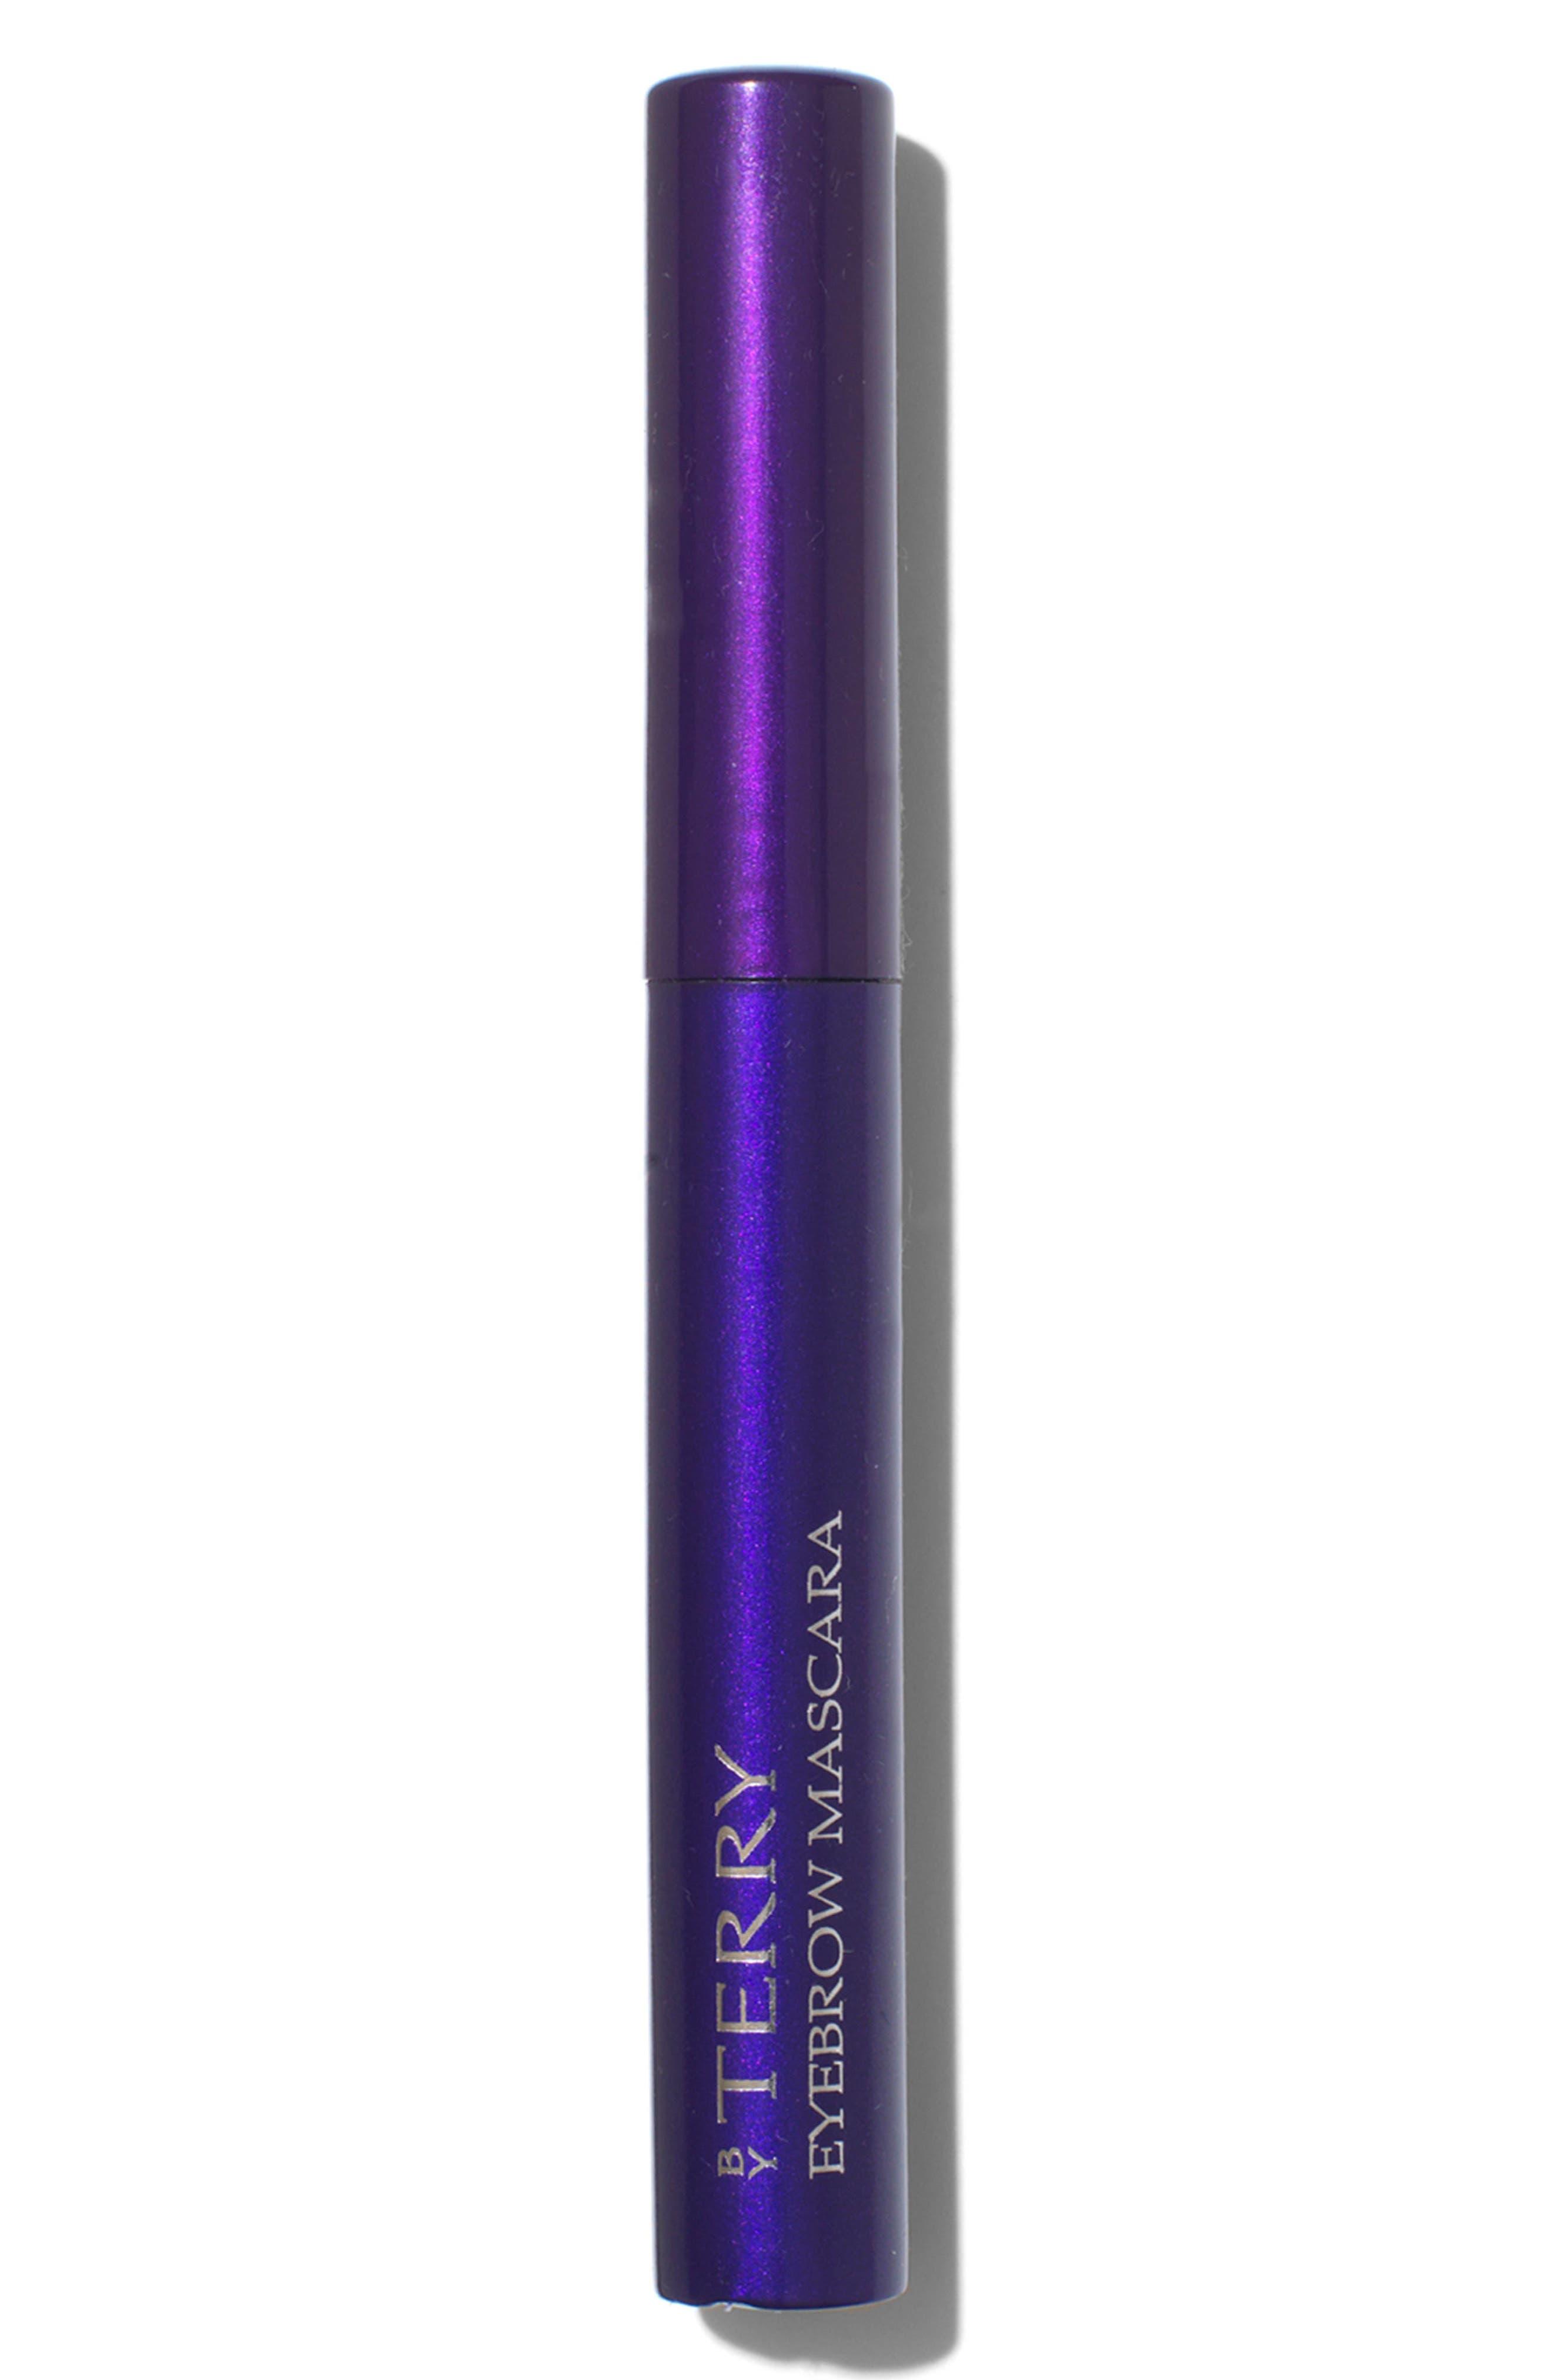 SPACE.NK.apothecary By Terry Eyebrow Mascara,                         Main,                         color, 1 Highlight Blonde